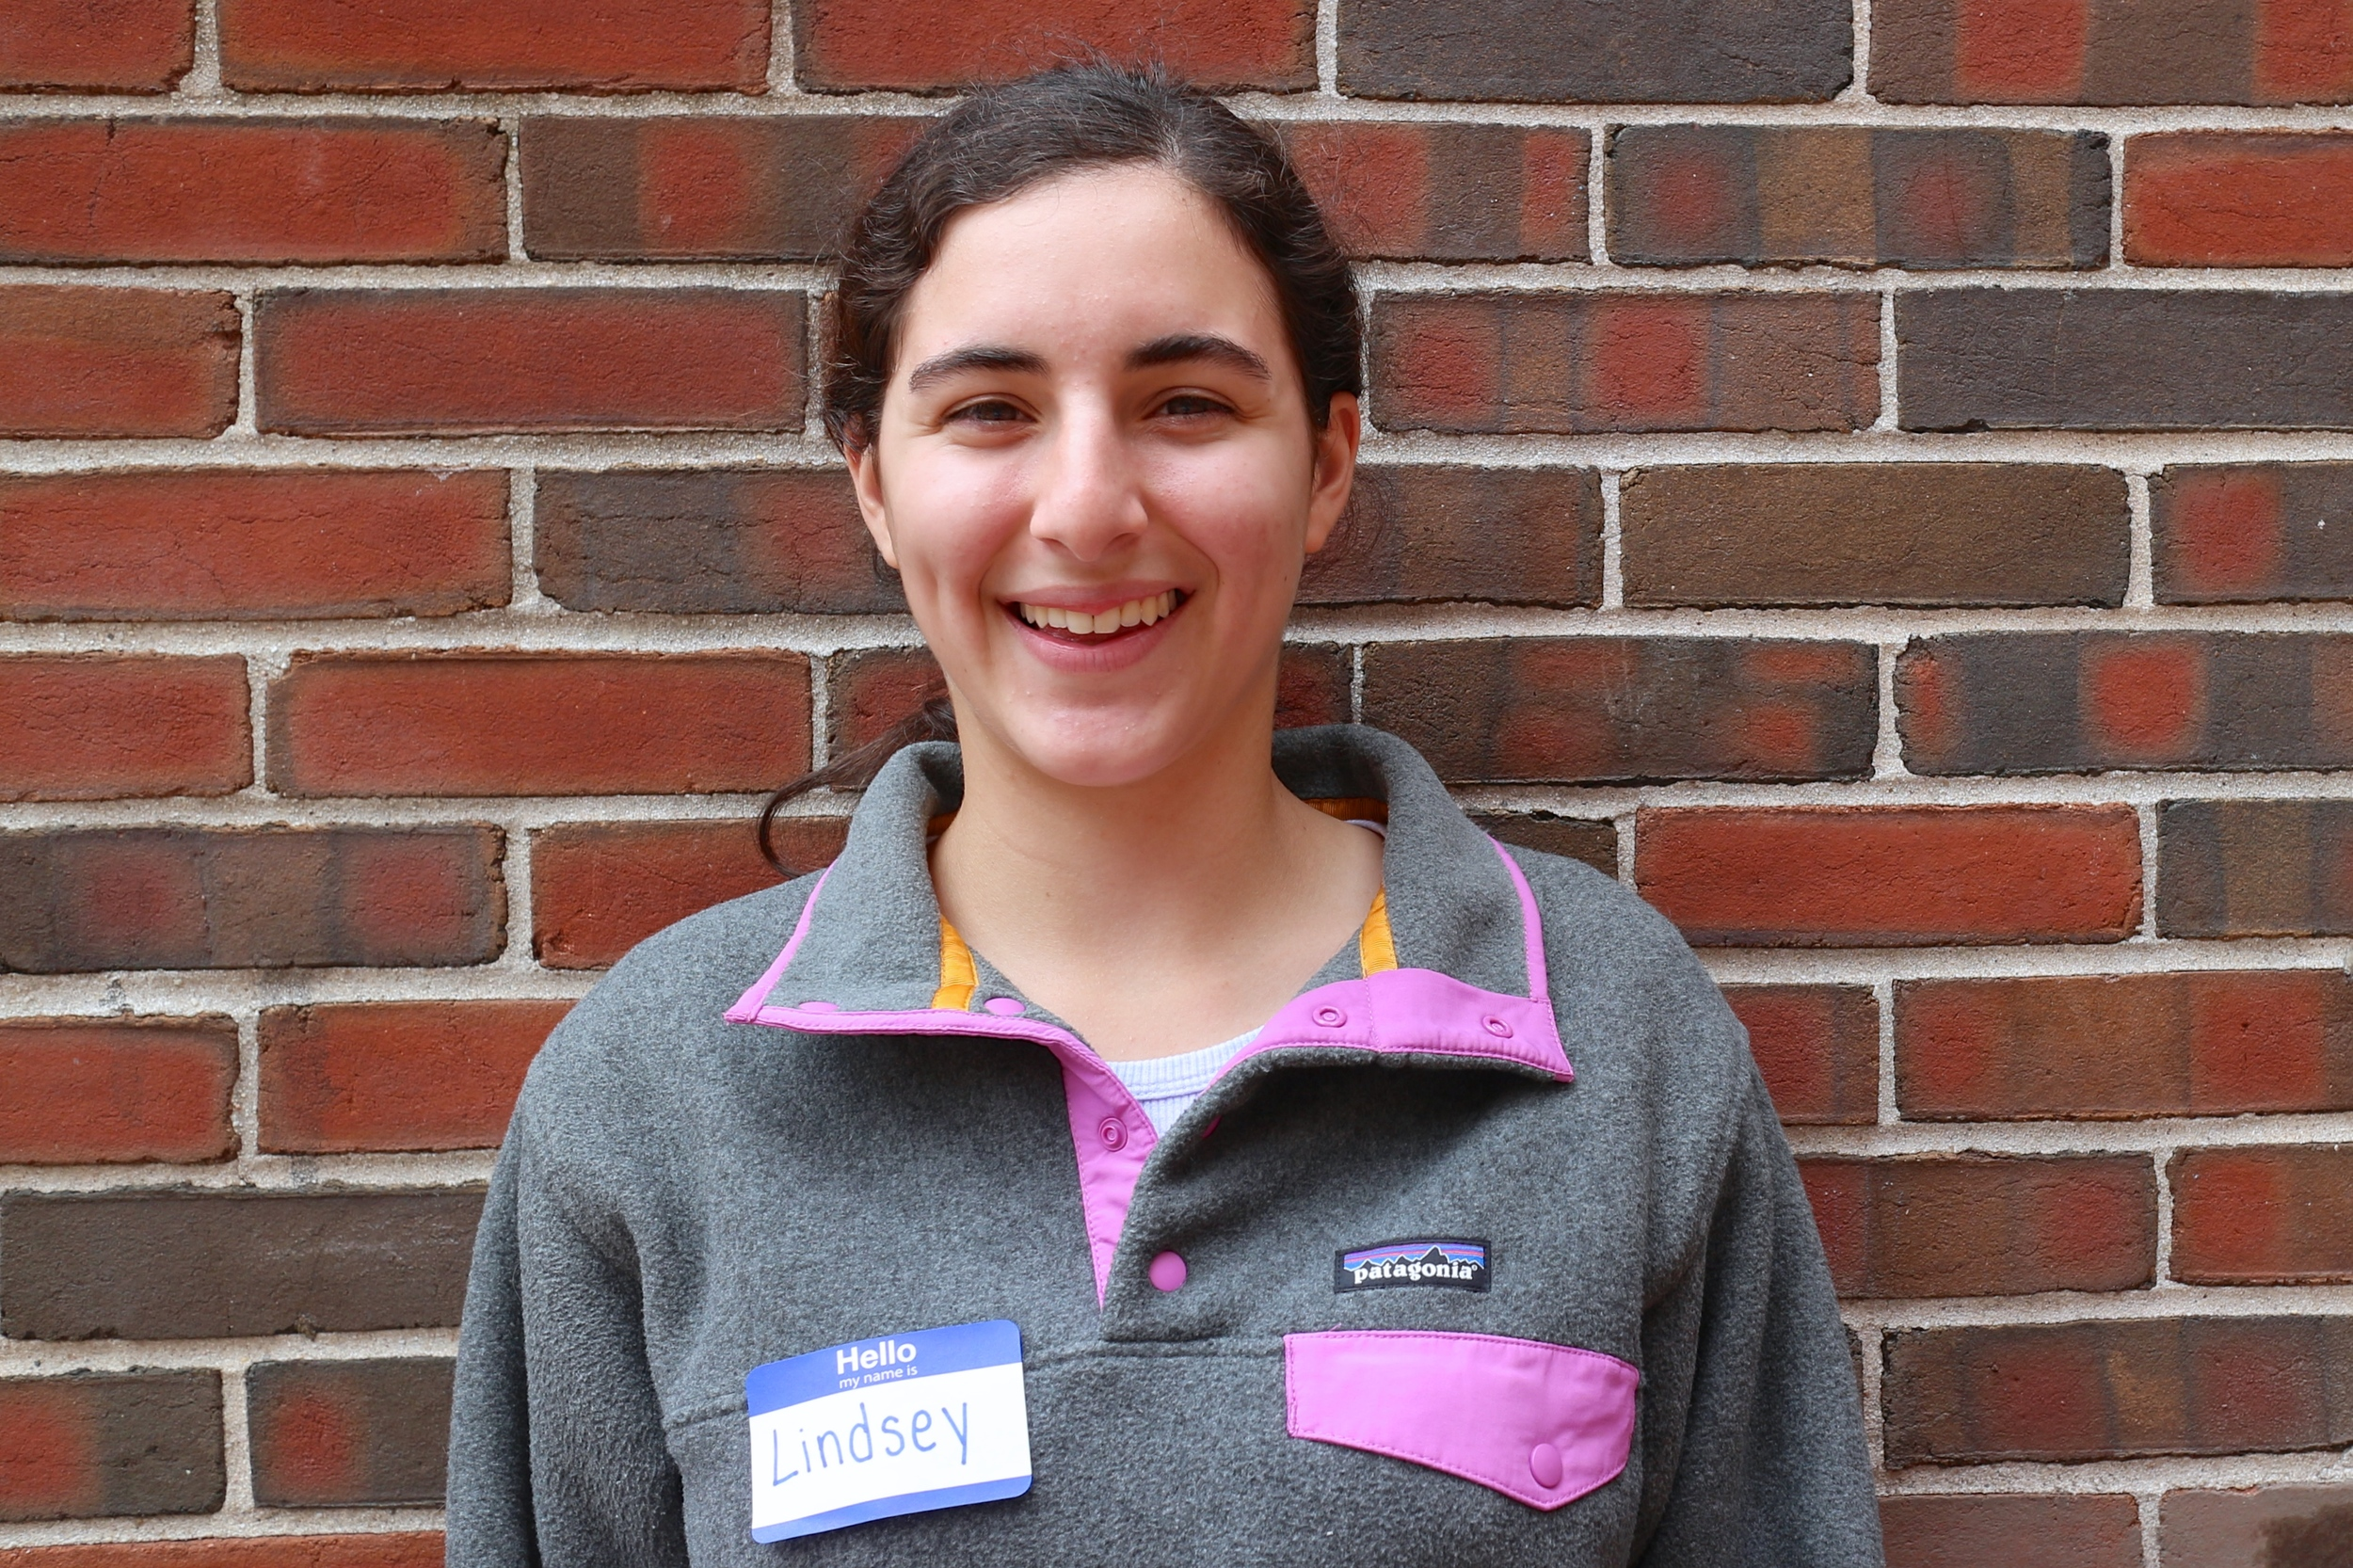 Lindsey Michelle Tarpinian